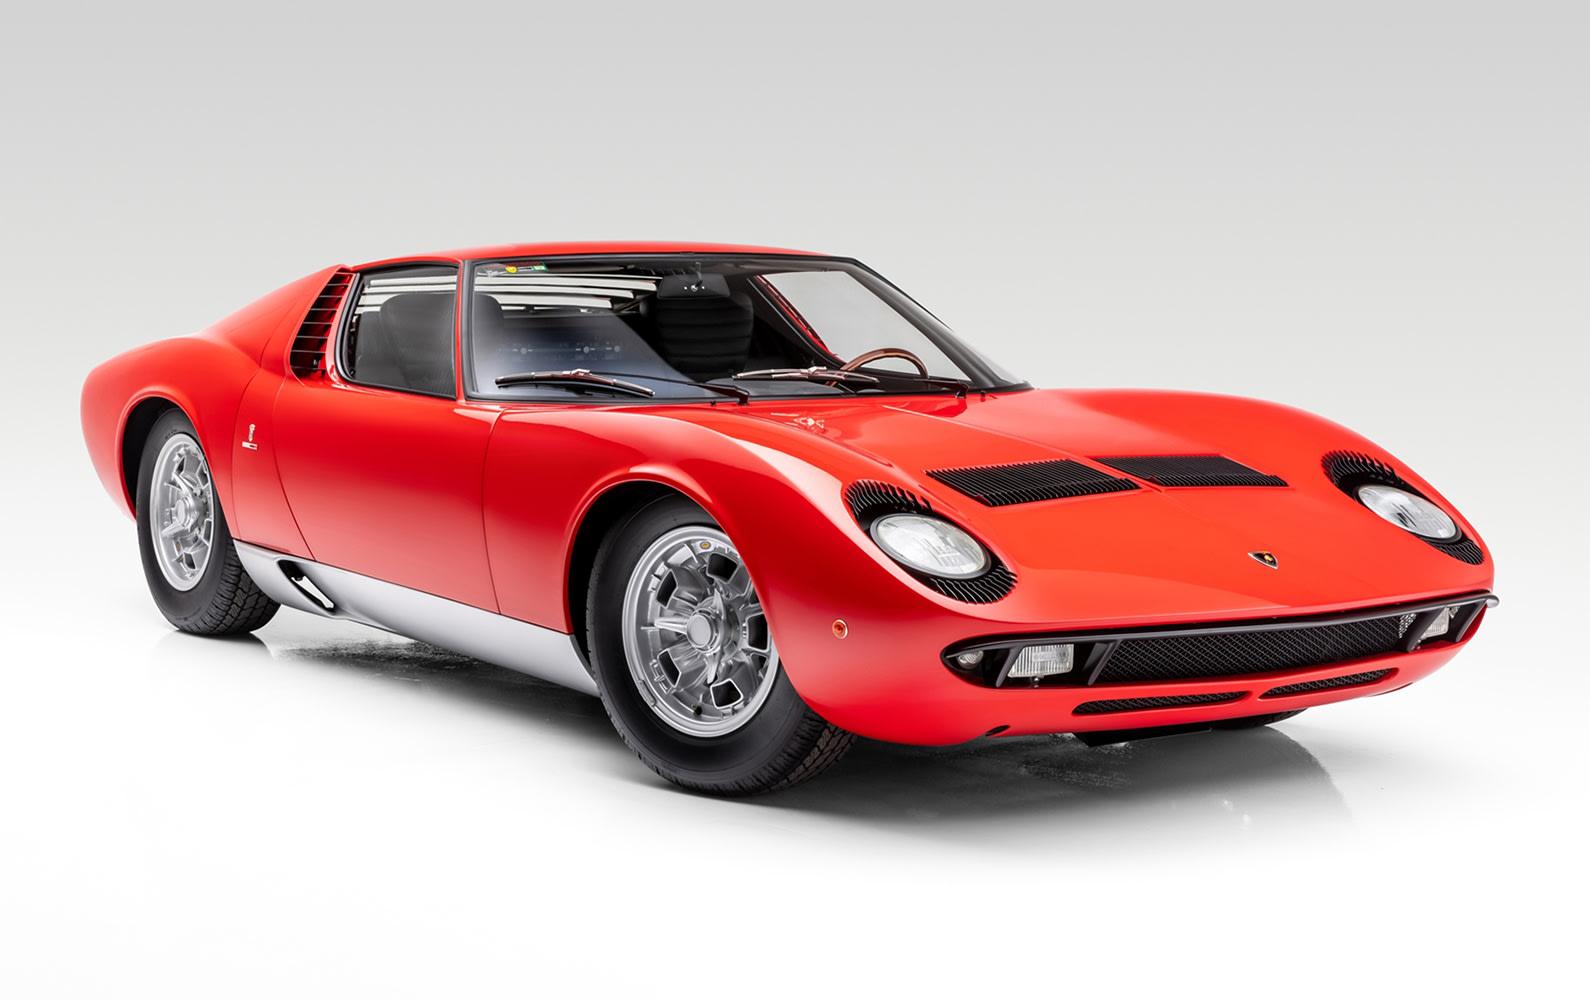 Prod/PB21 - Pebble Beach Auctions 2021/611 — 1968 Lamborghini Miura P400/1968_Lamborghini_Miura_P400_34_a8sq4t